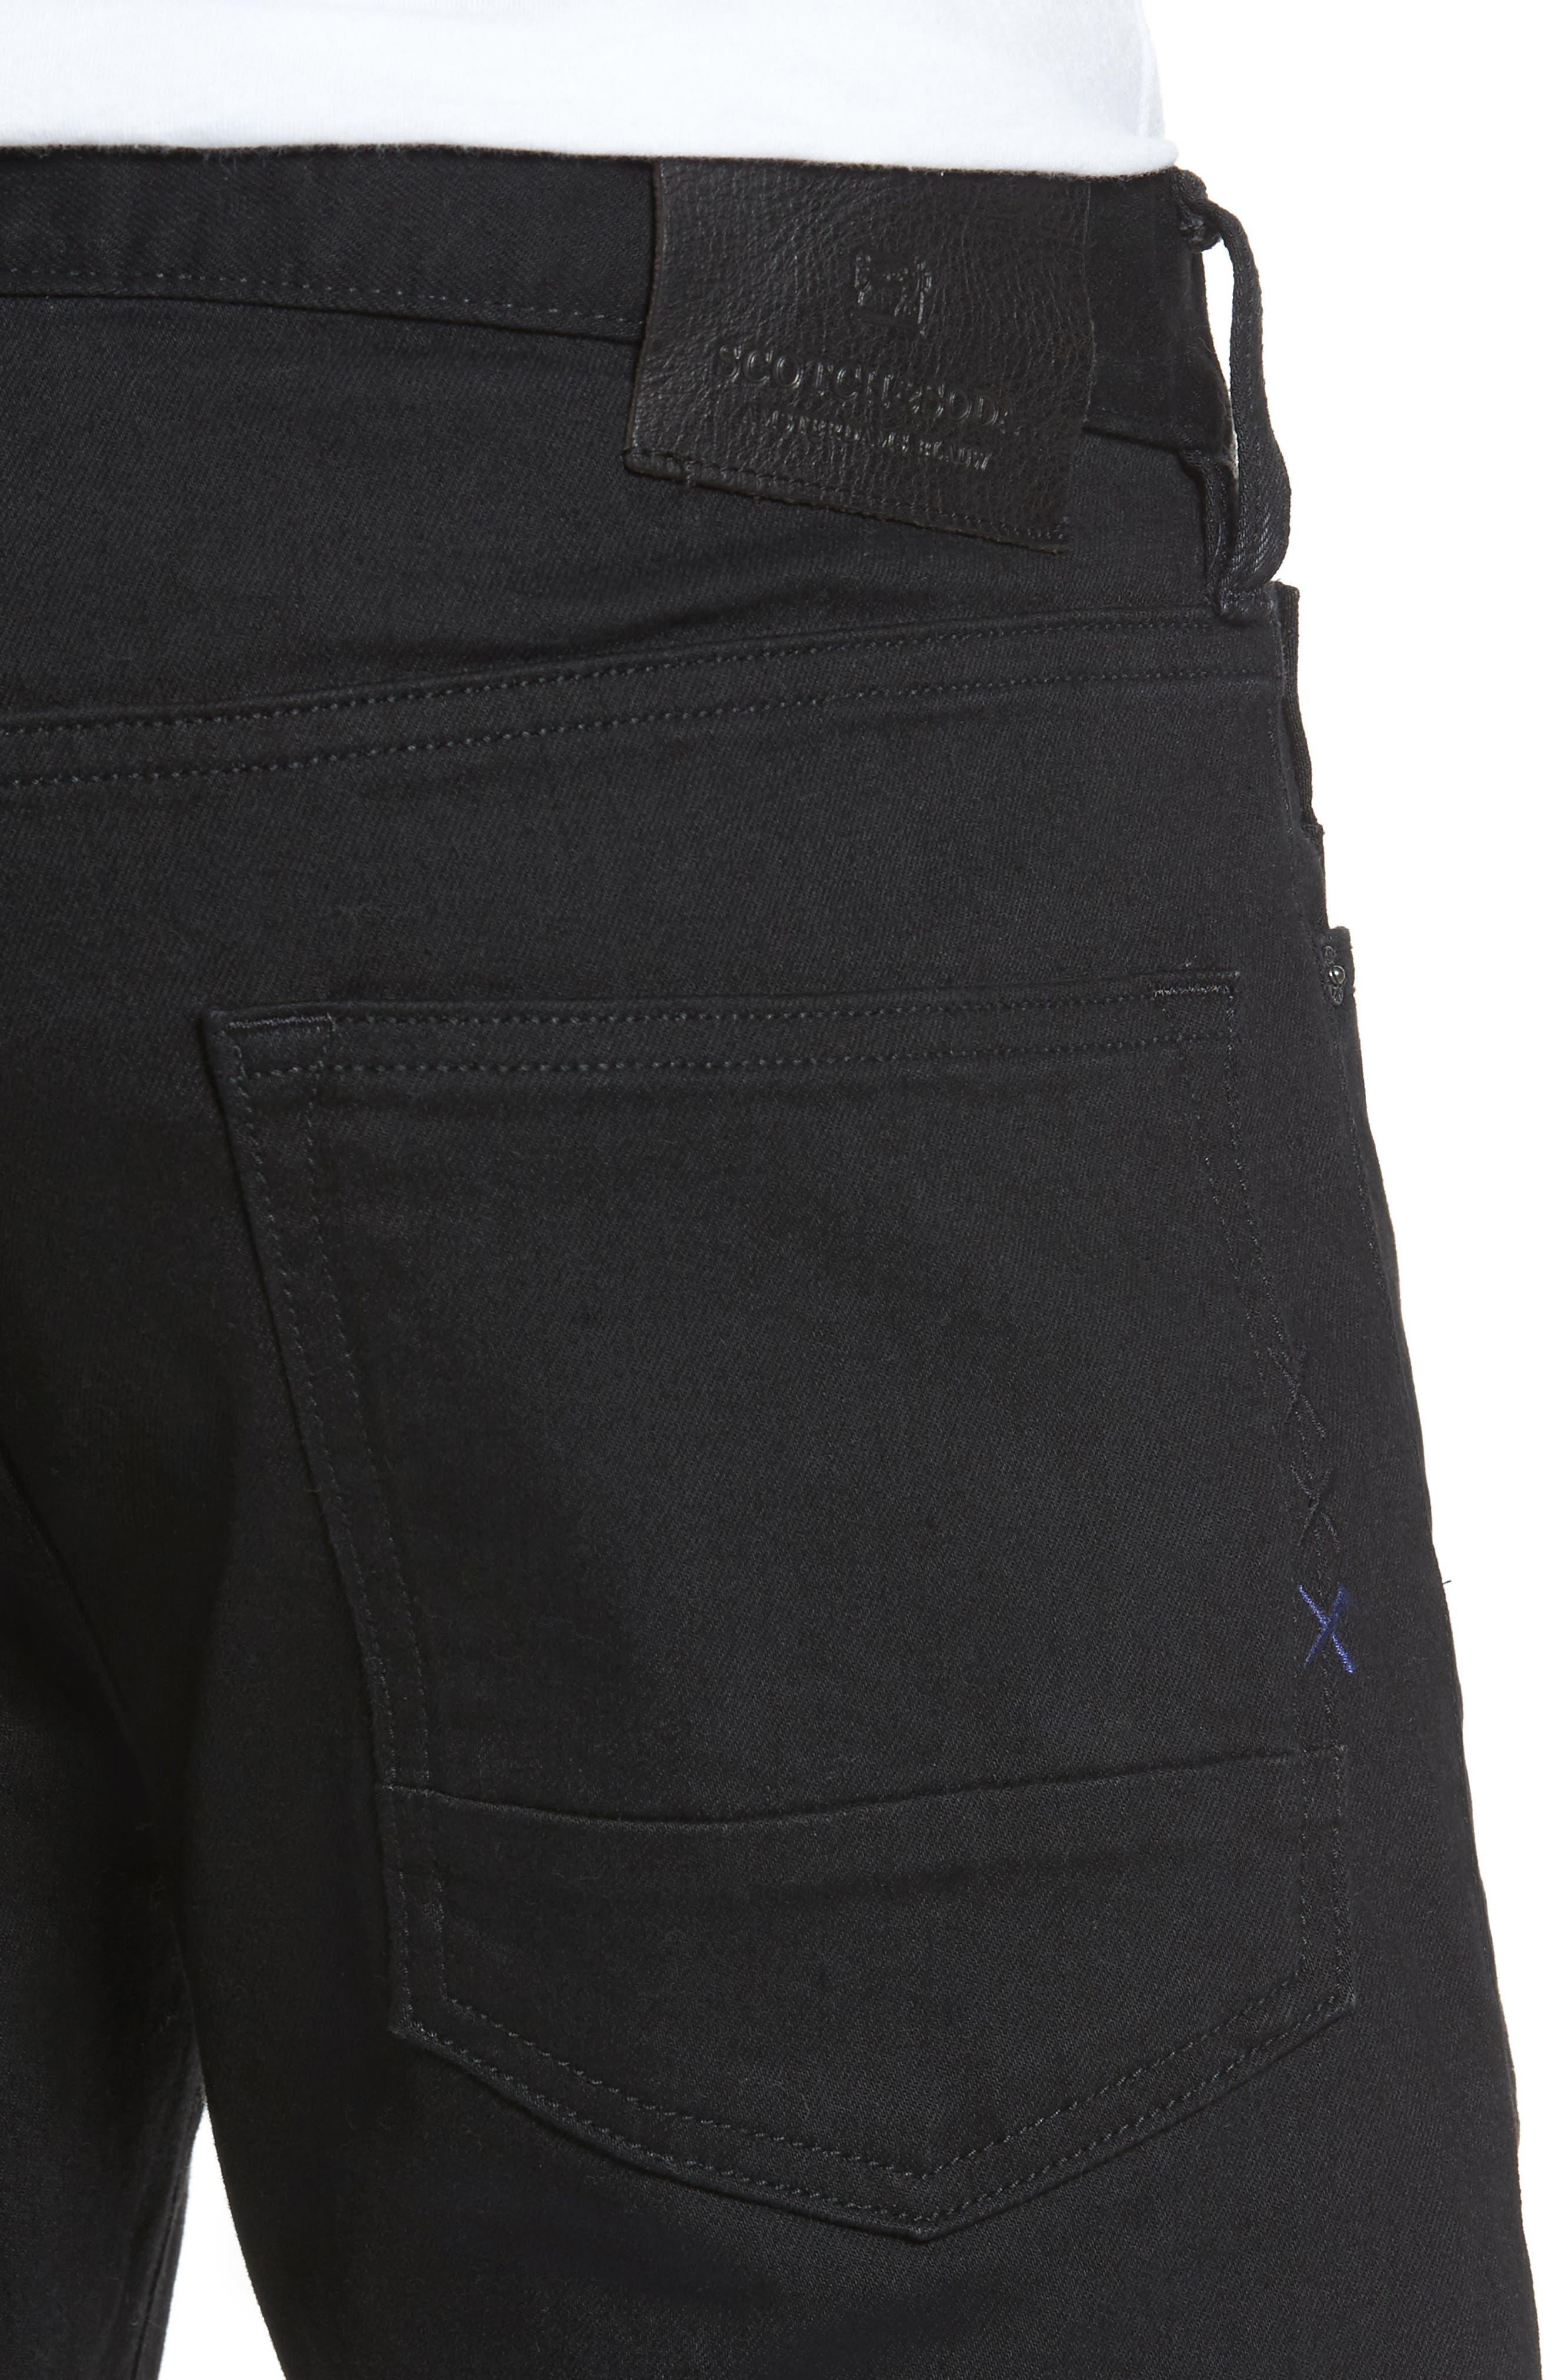 Alternate Image 4  - Scotch & Soda Ralston Slim Straight Leg Jeans (Stay Black)